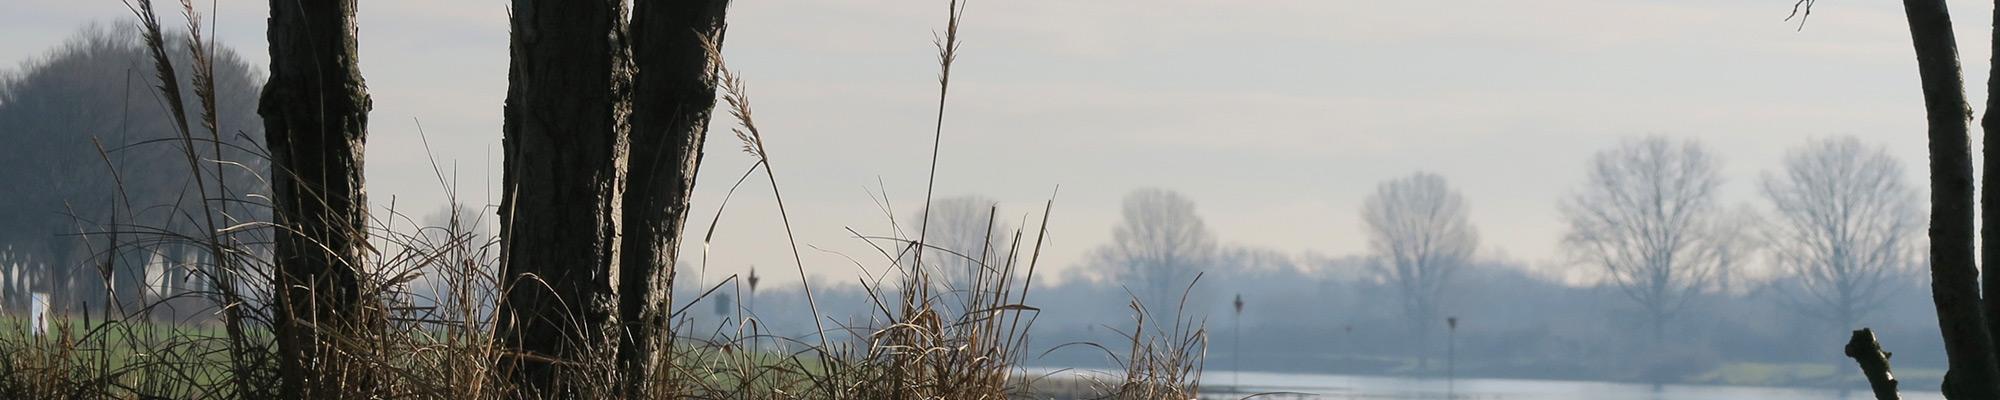 Maasoever © Anne-Riet